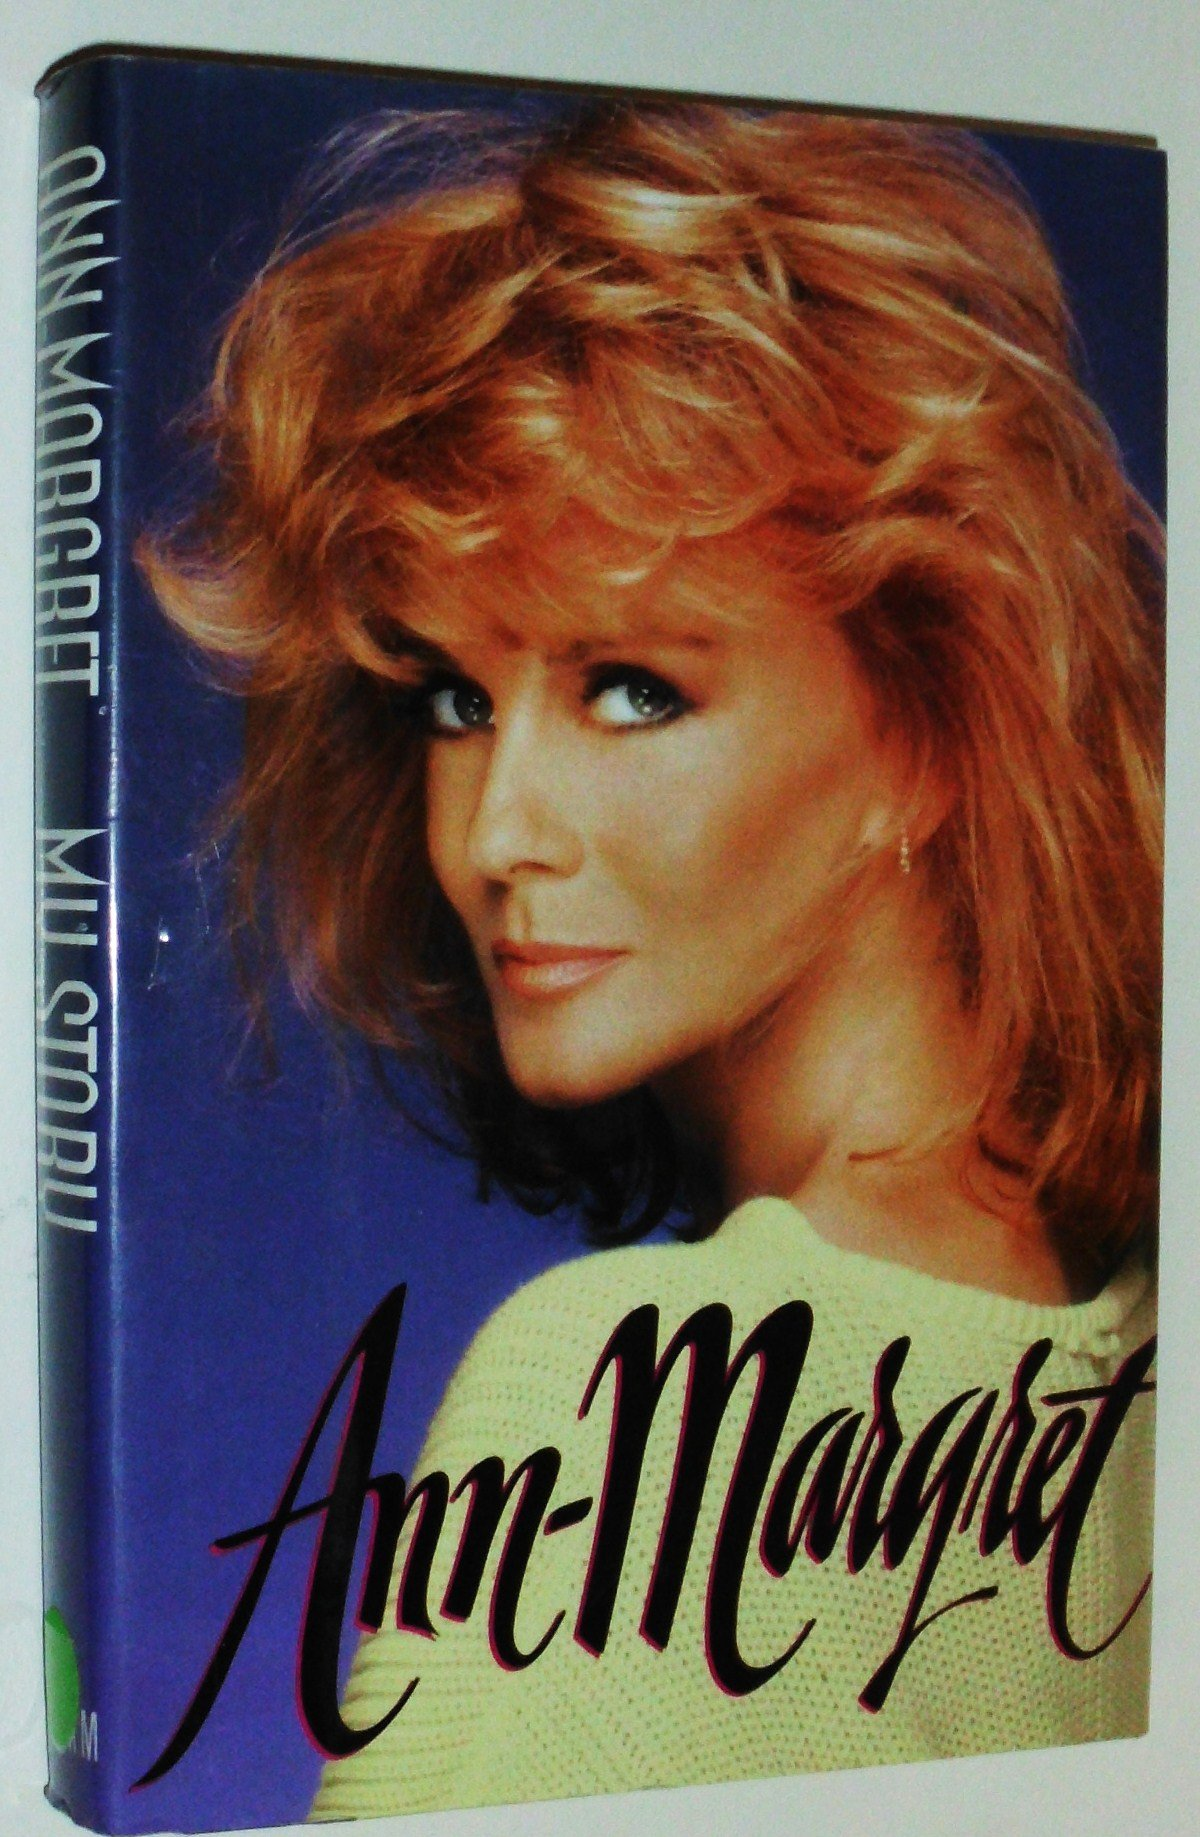 Ann Margret: My Story: Amazon.es: Margret, Ann: Libros en ...